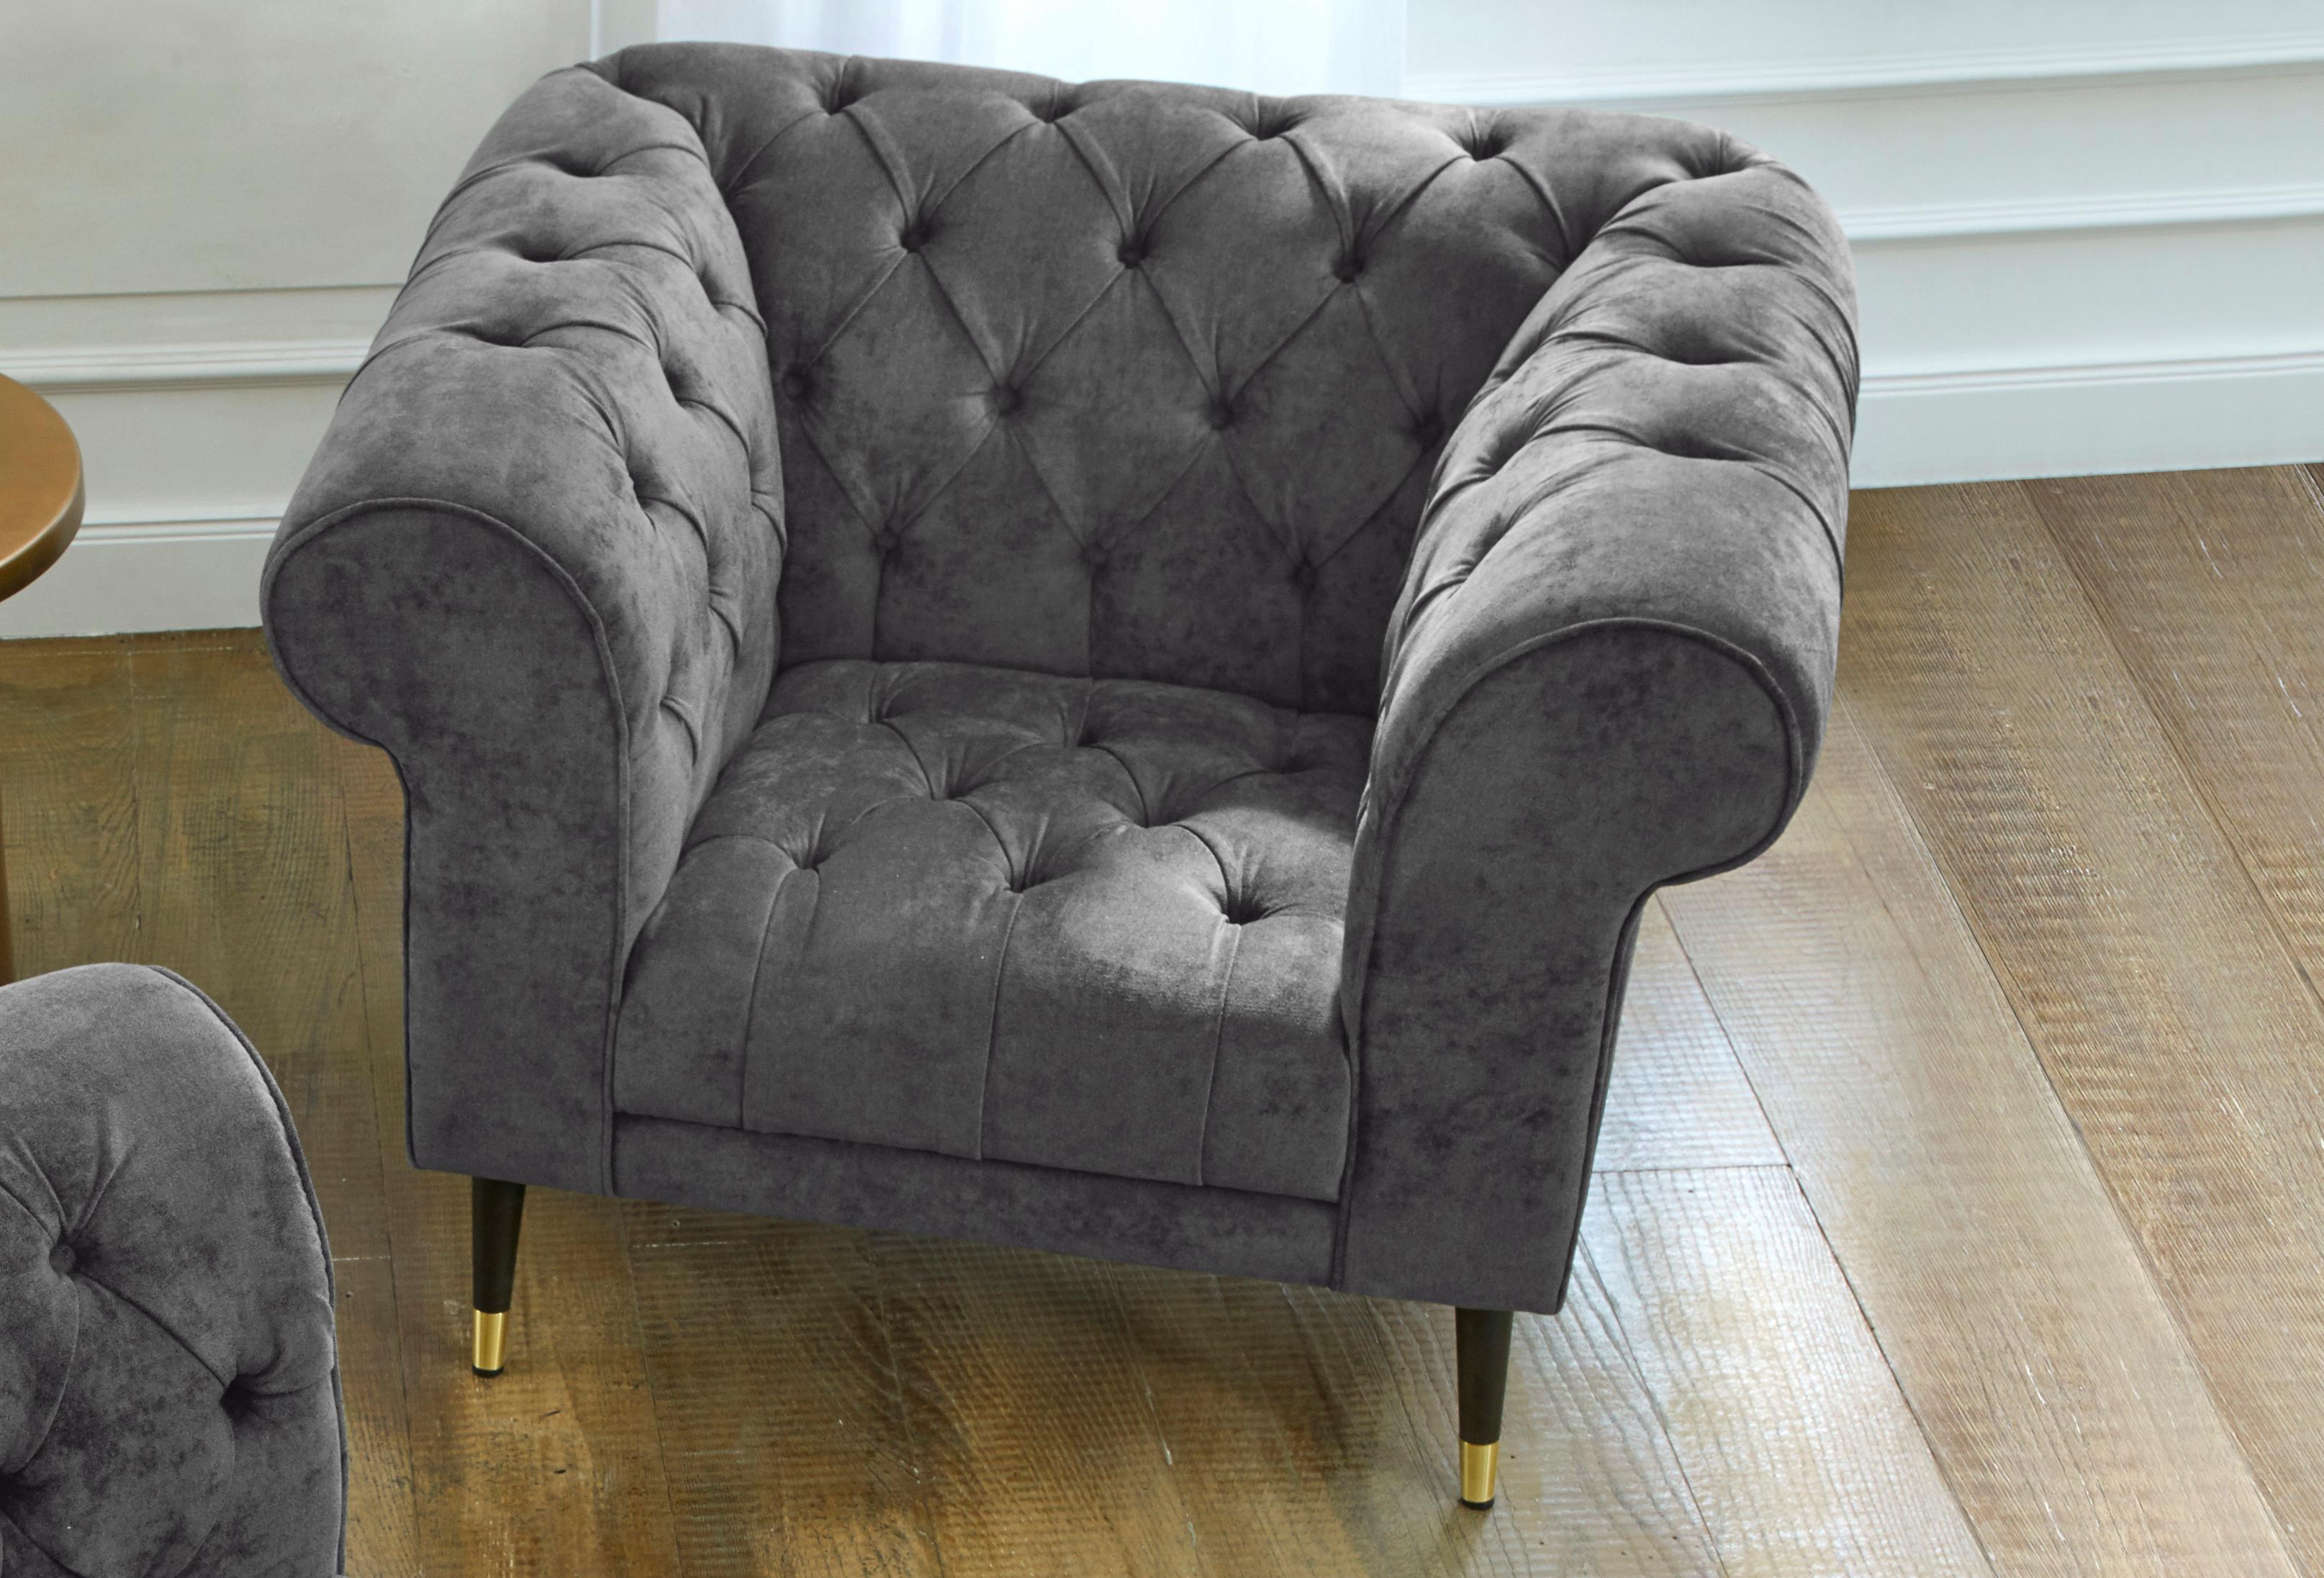 GMK Home & Living Chesterfield Sessel »Tinnum« | Wohnzimmer > Sessel > Chesterfield Sessel | Kunststoff - Microfaser | Guido Maria Kretschmer Home & Living